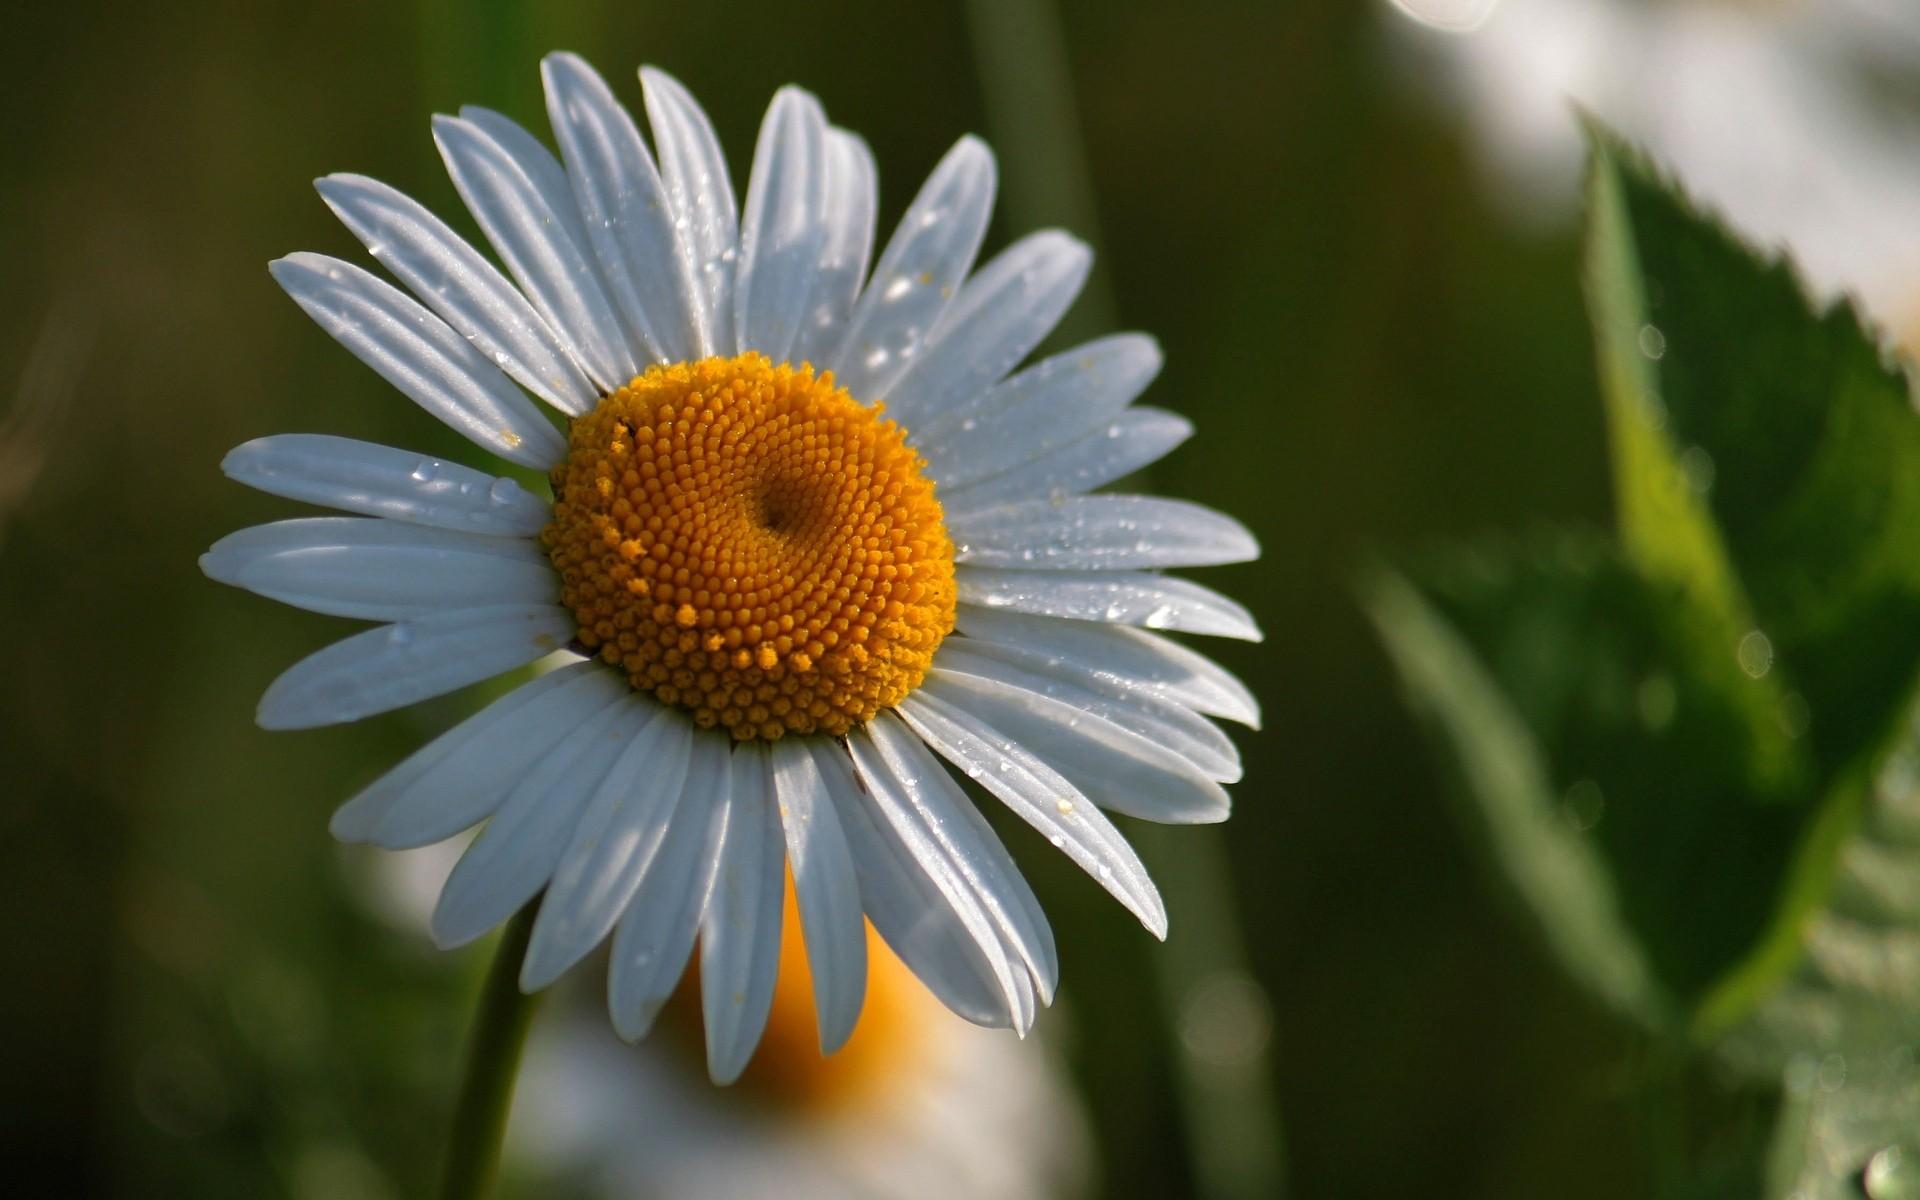 интересует публику фото цветка ромашки комплекс памяти